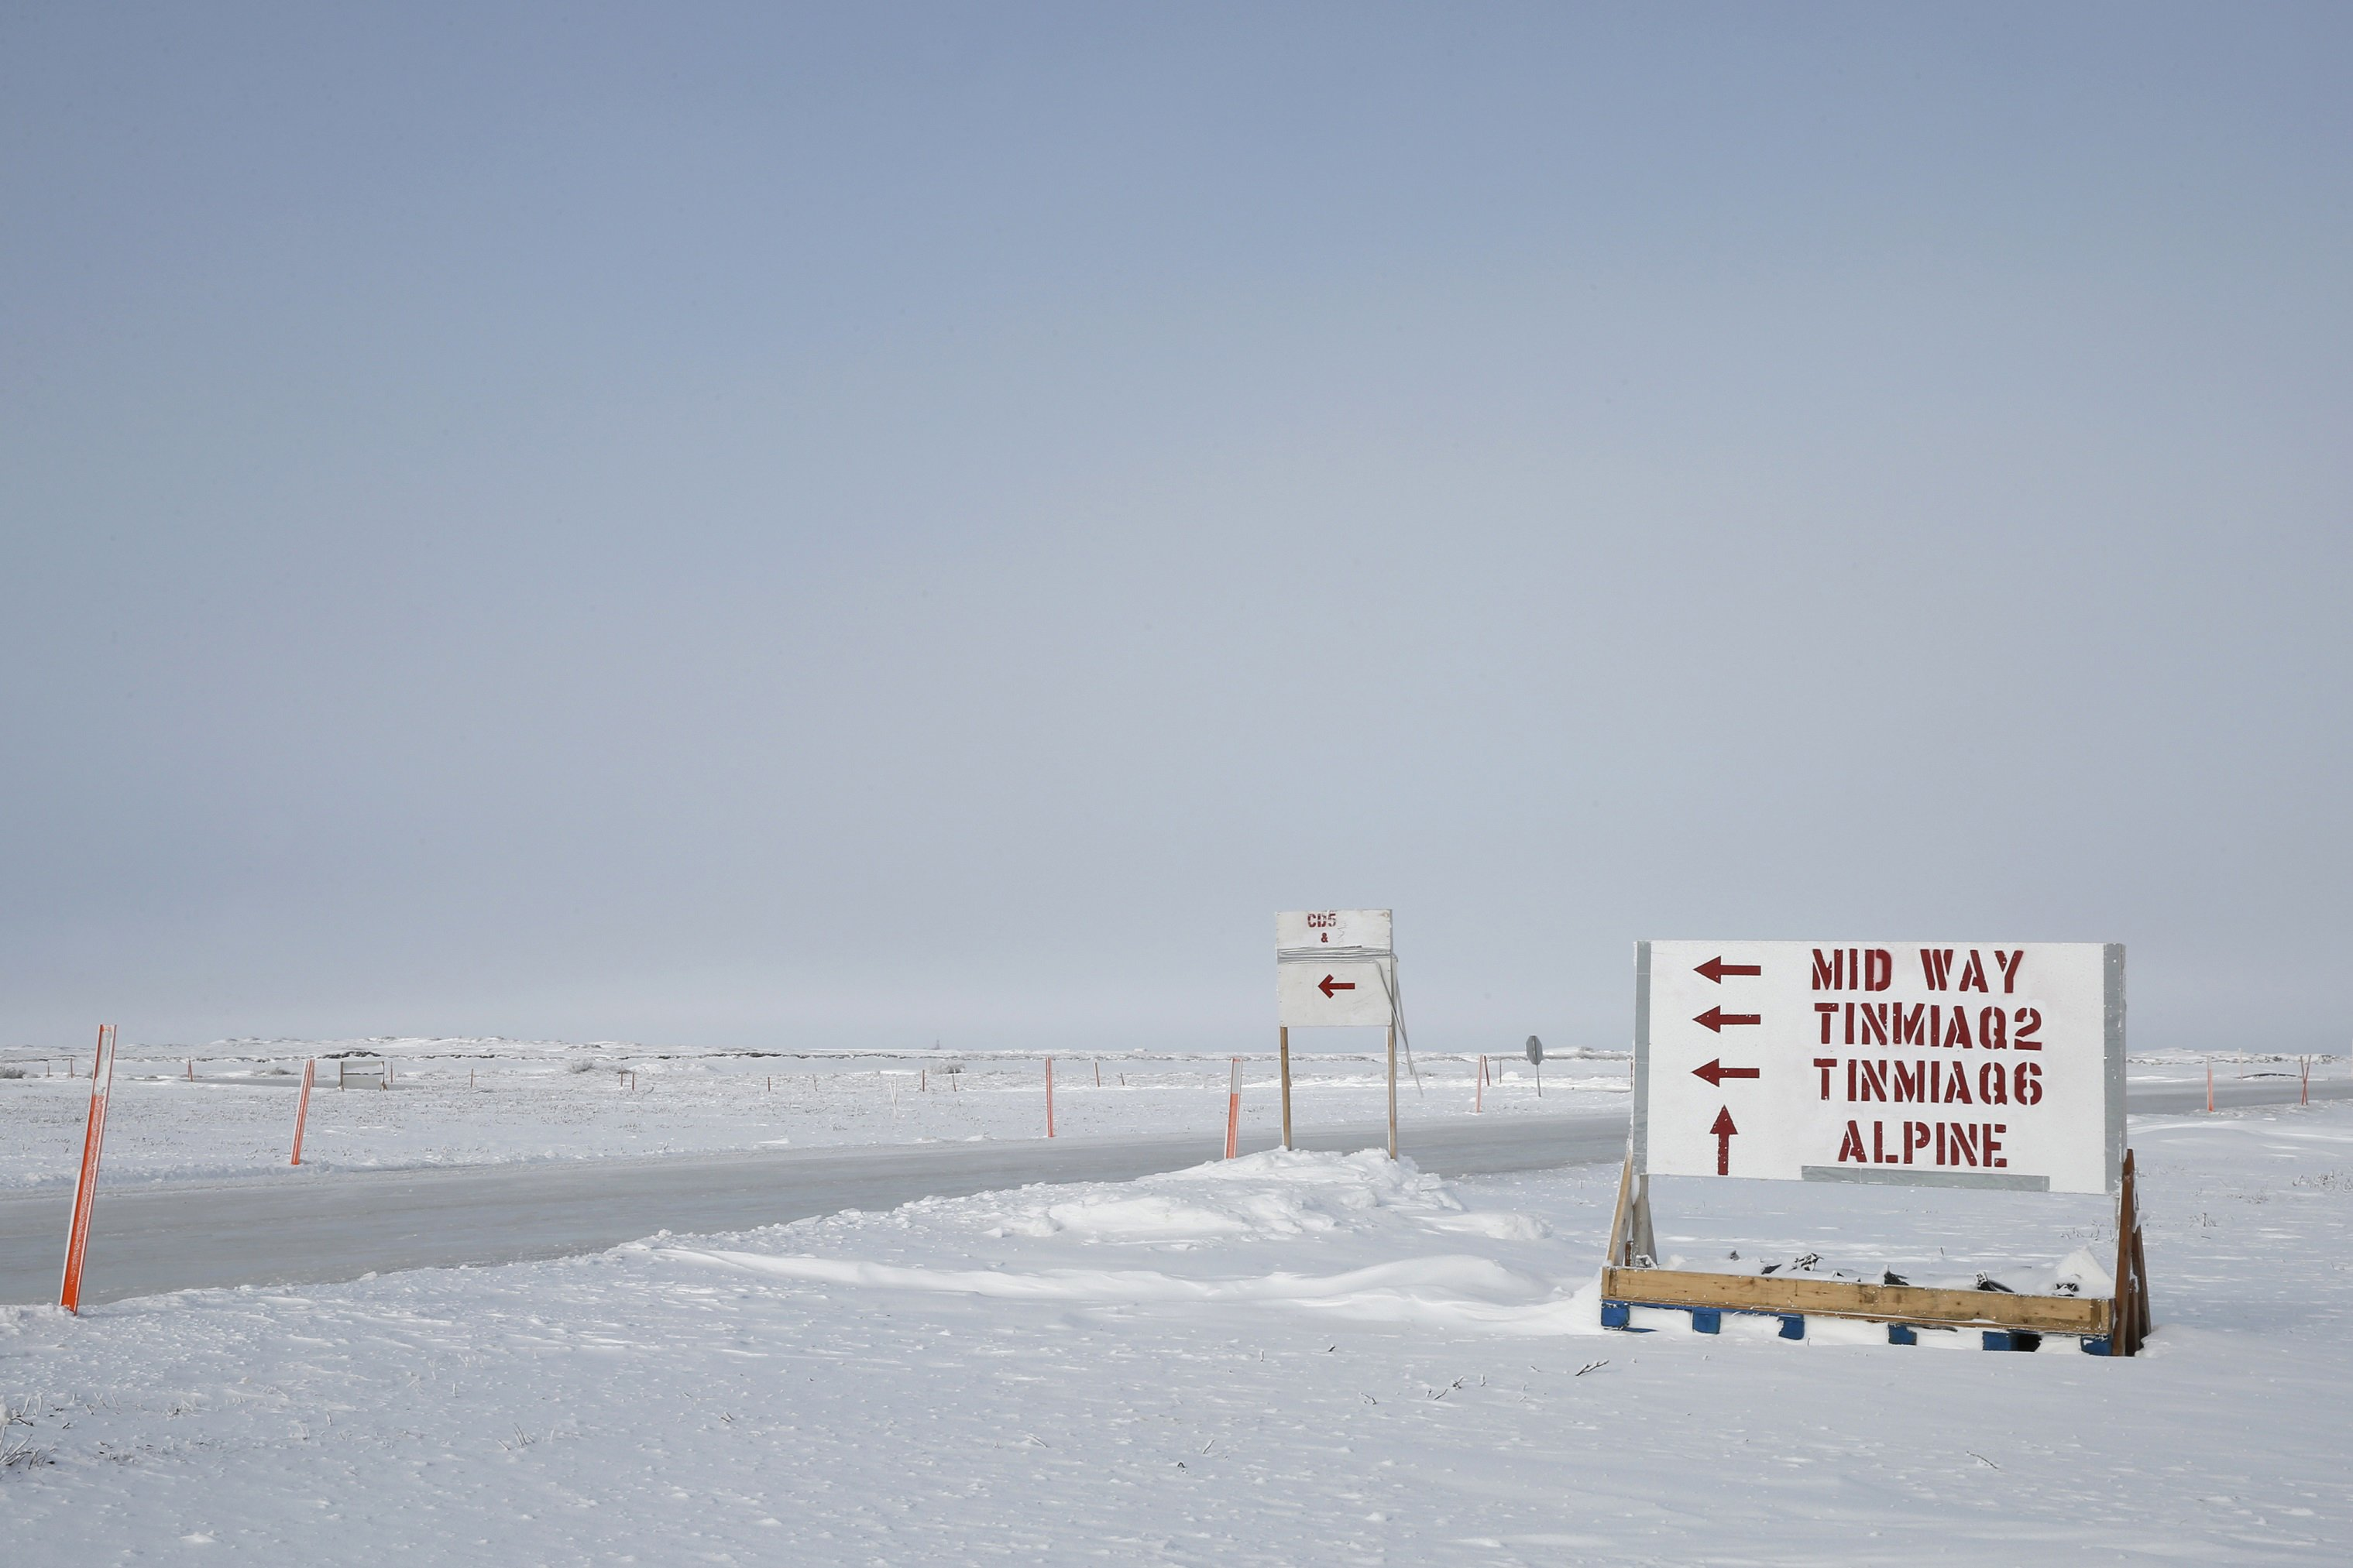 Trump administration issues go-ahead for a major Arctic Alaska oil project